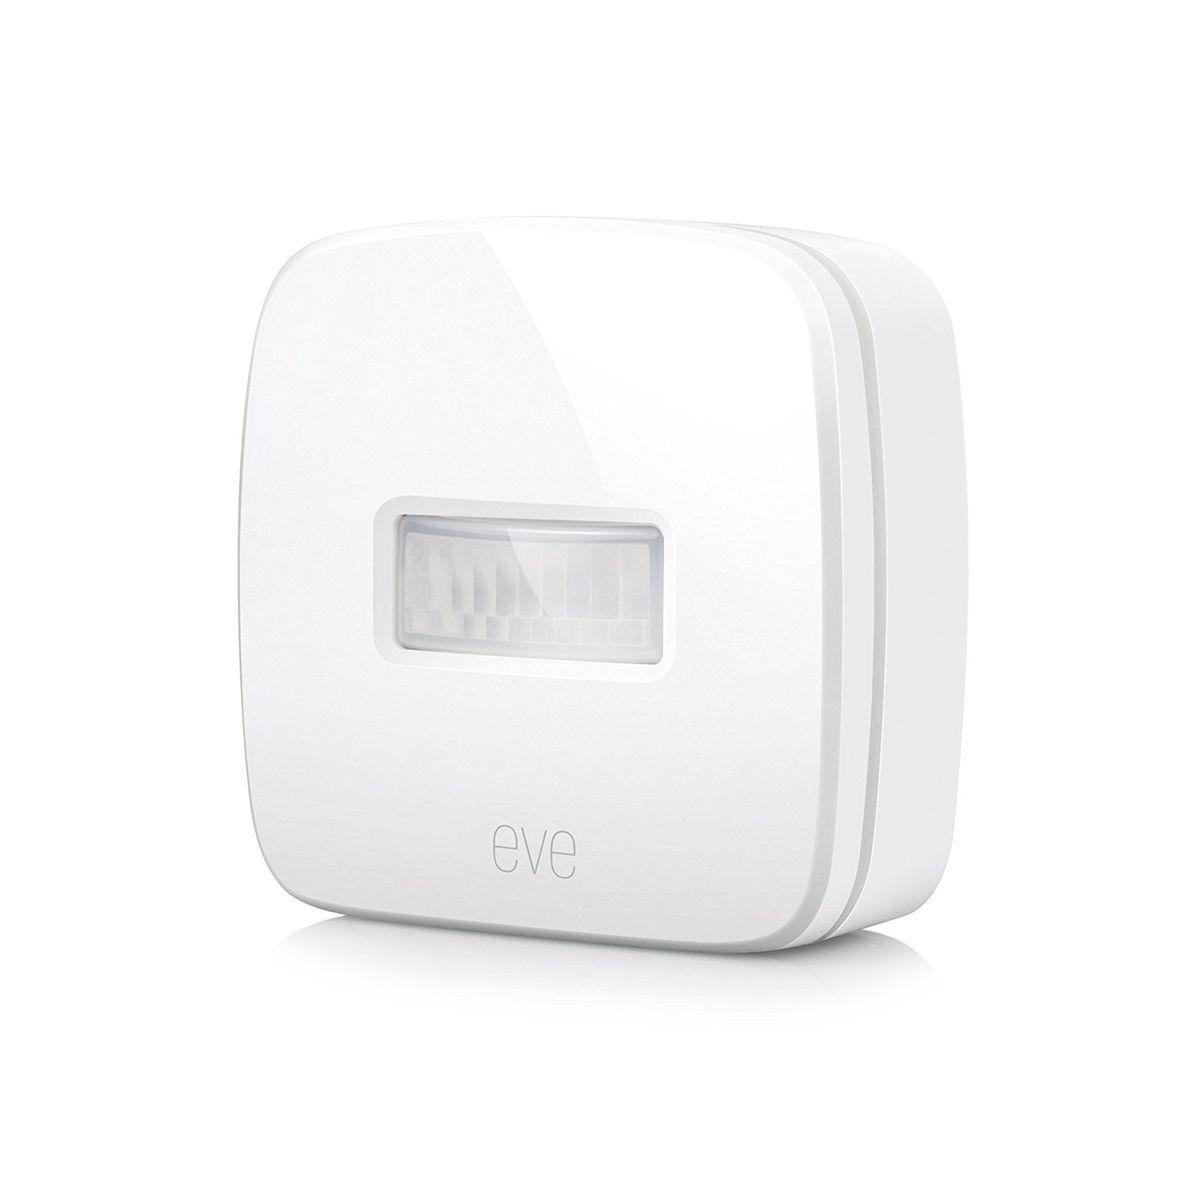 Elgato Eve Motion Sensor Wireless Motion Sensor